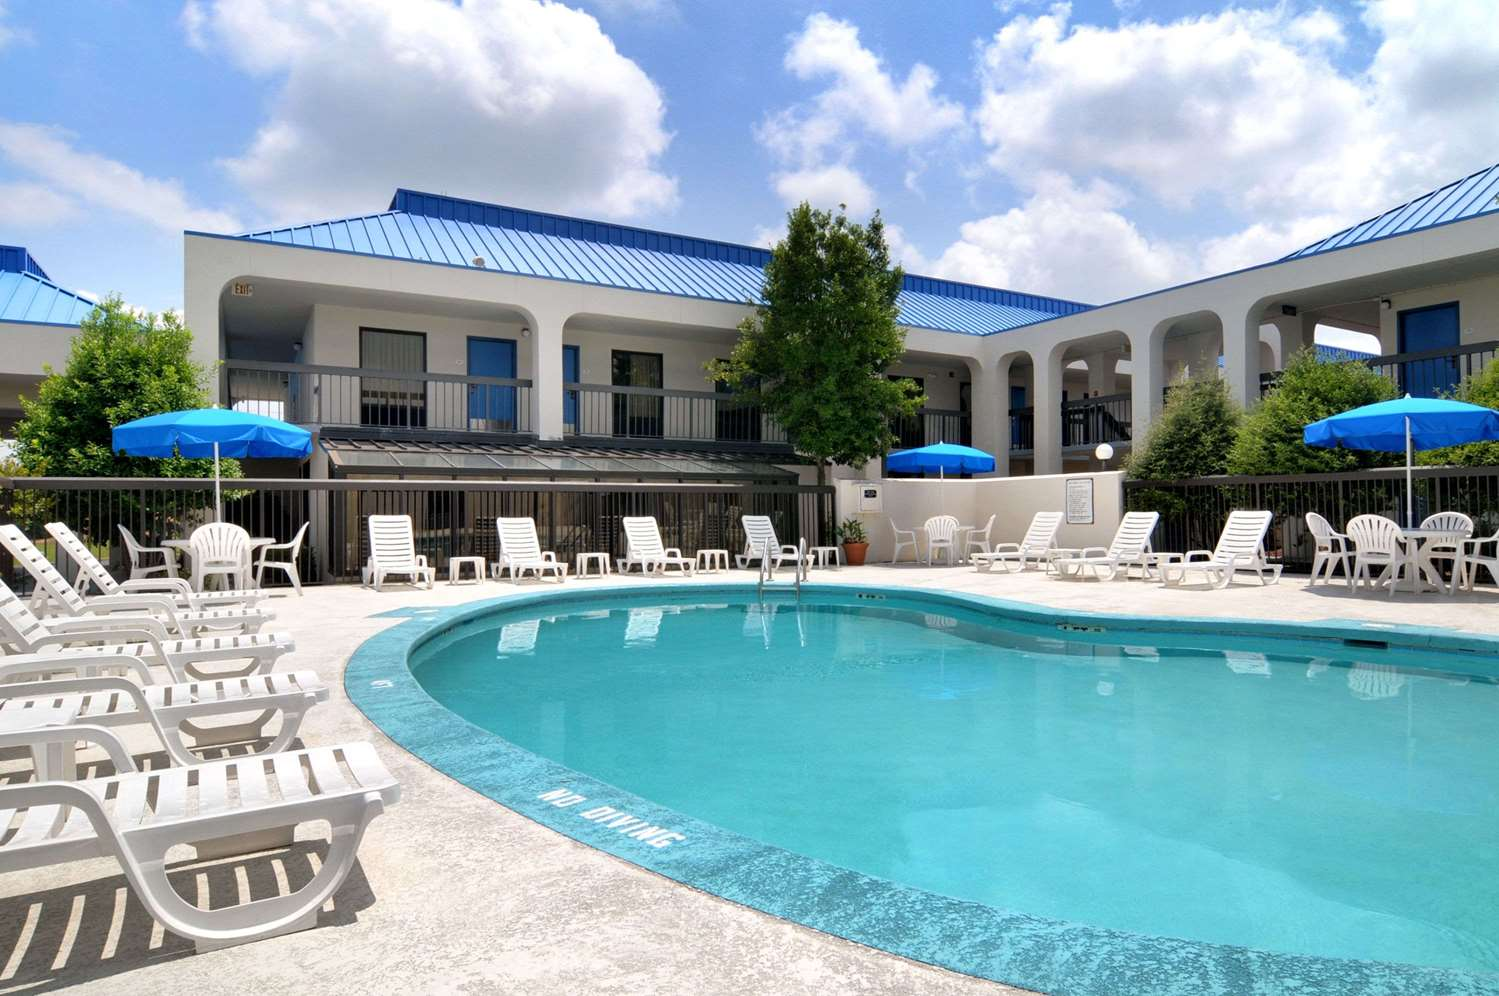 Pool - Baymont Inn & Suites Riverside Drive Macon